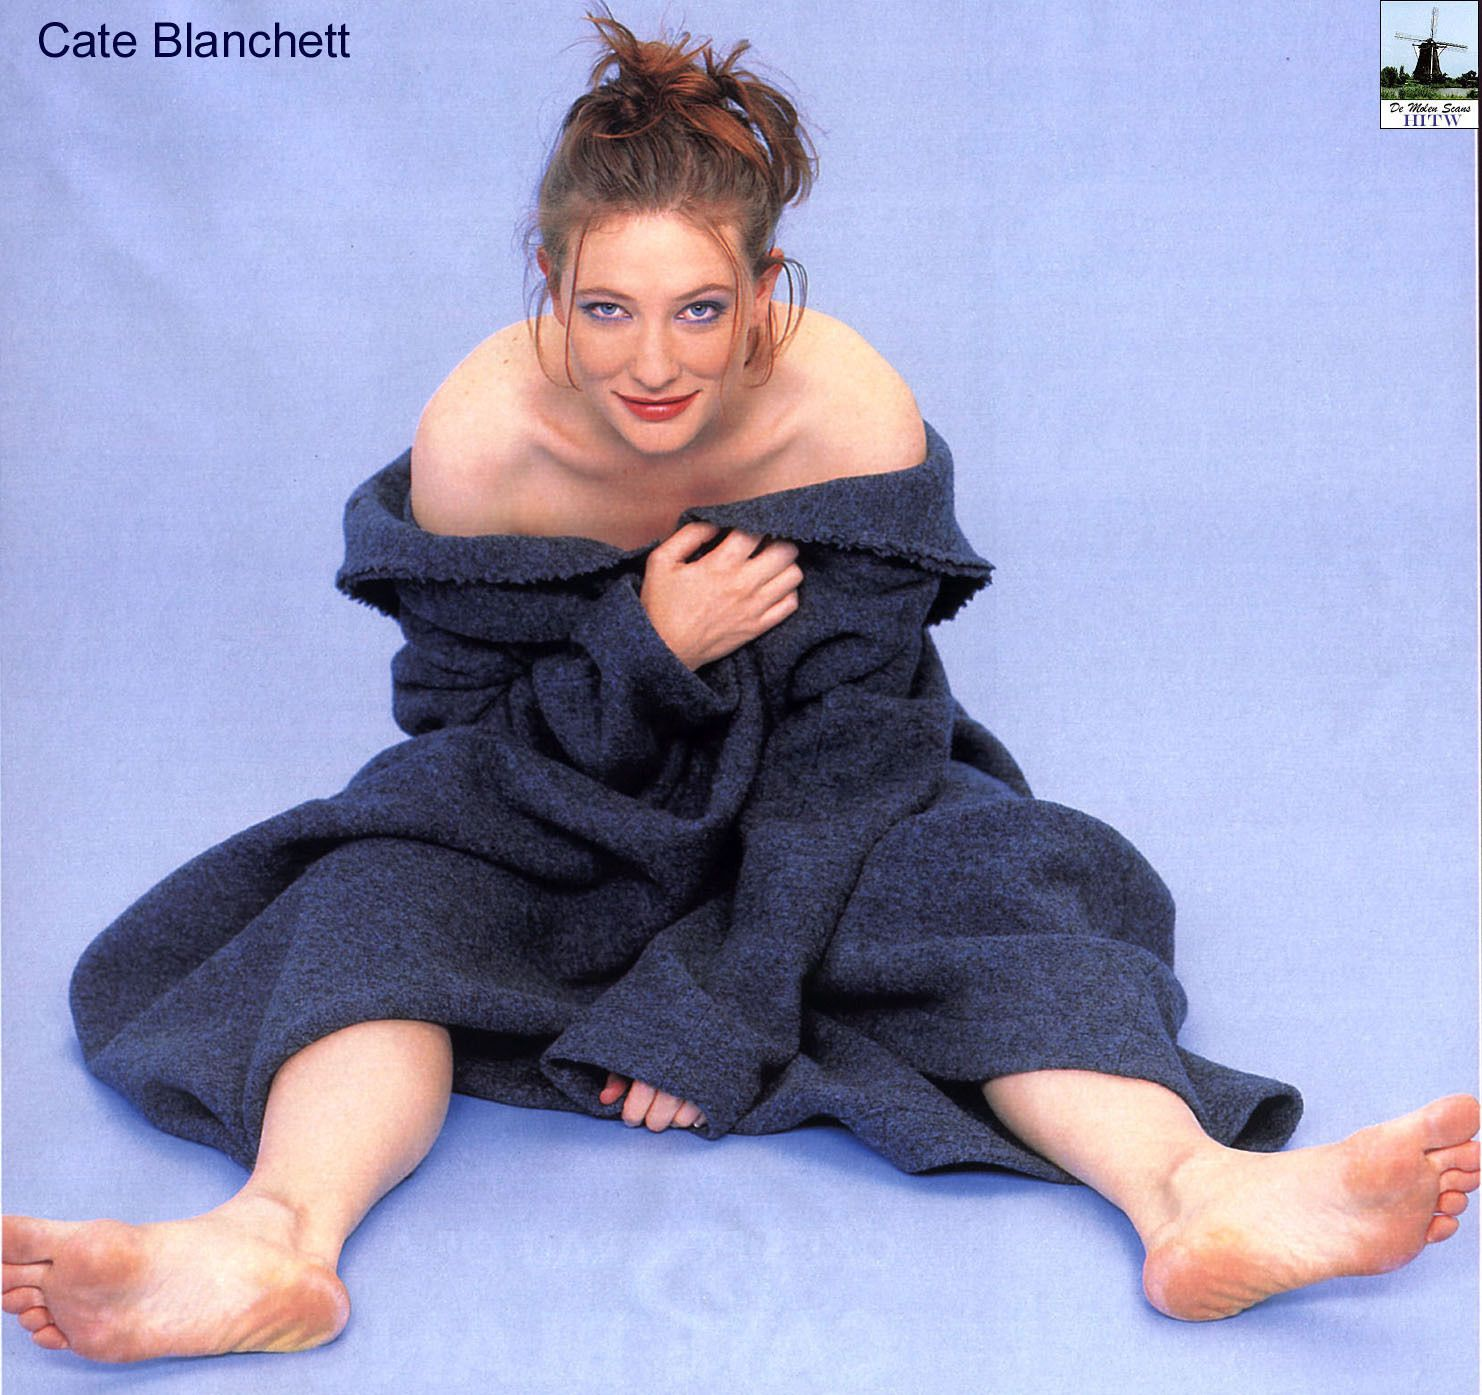 Feet Cate Blanchett nudes (57 photos), Topless, Bikini, Feet, braless 2019